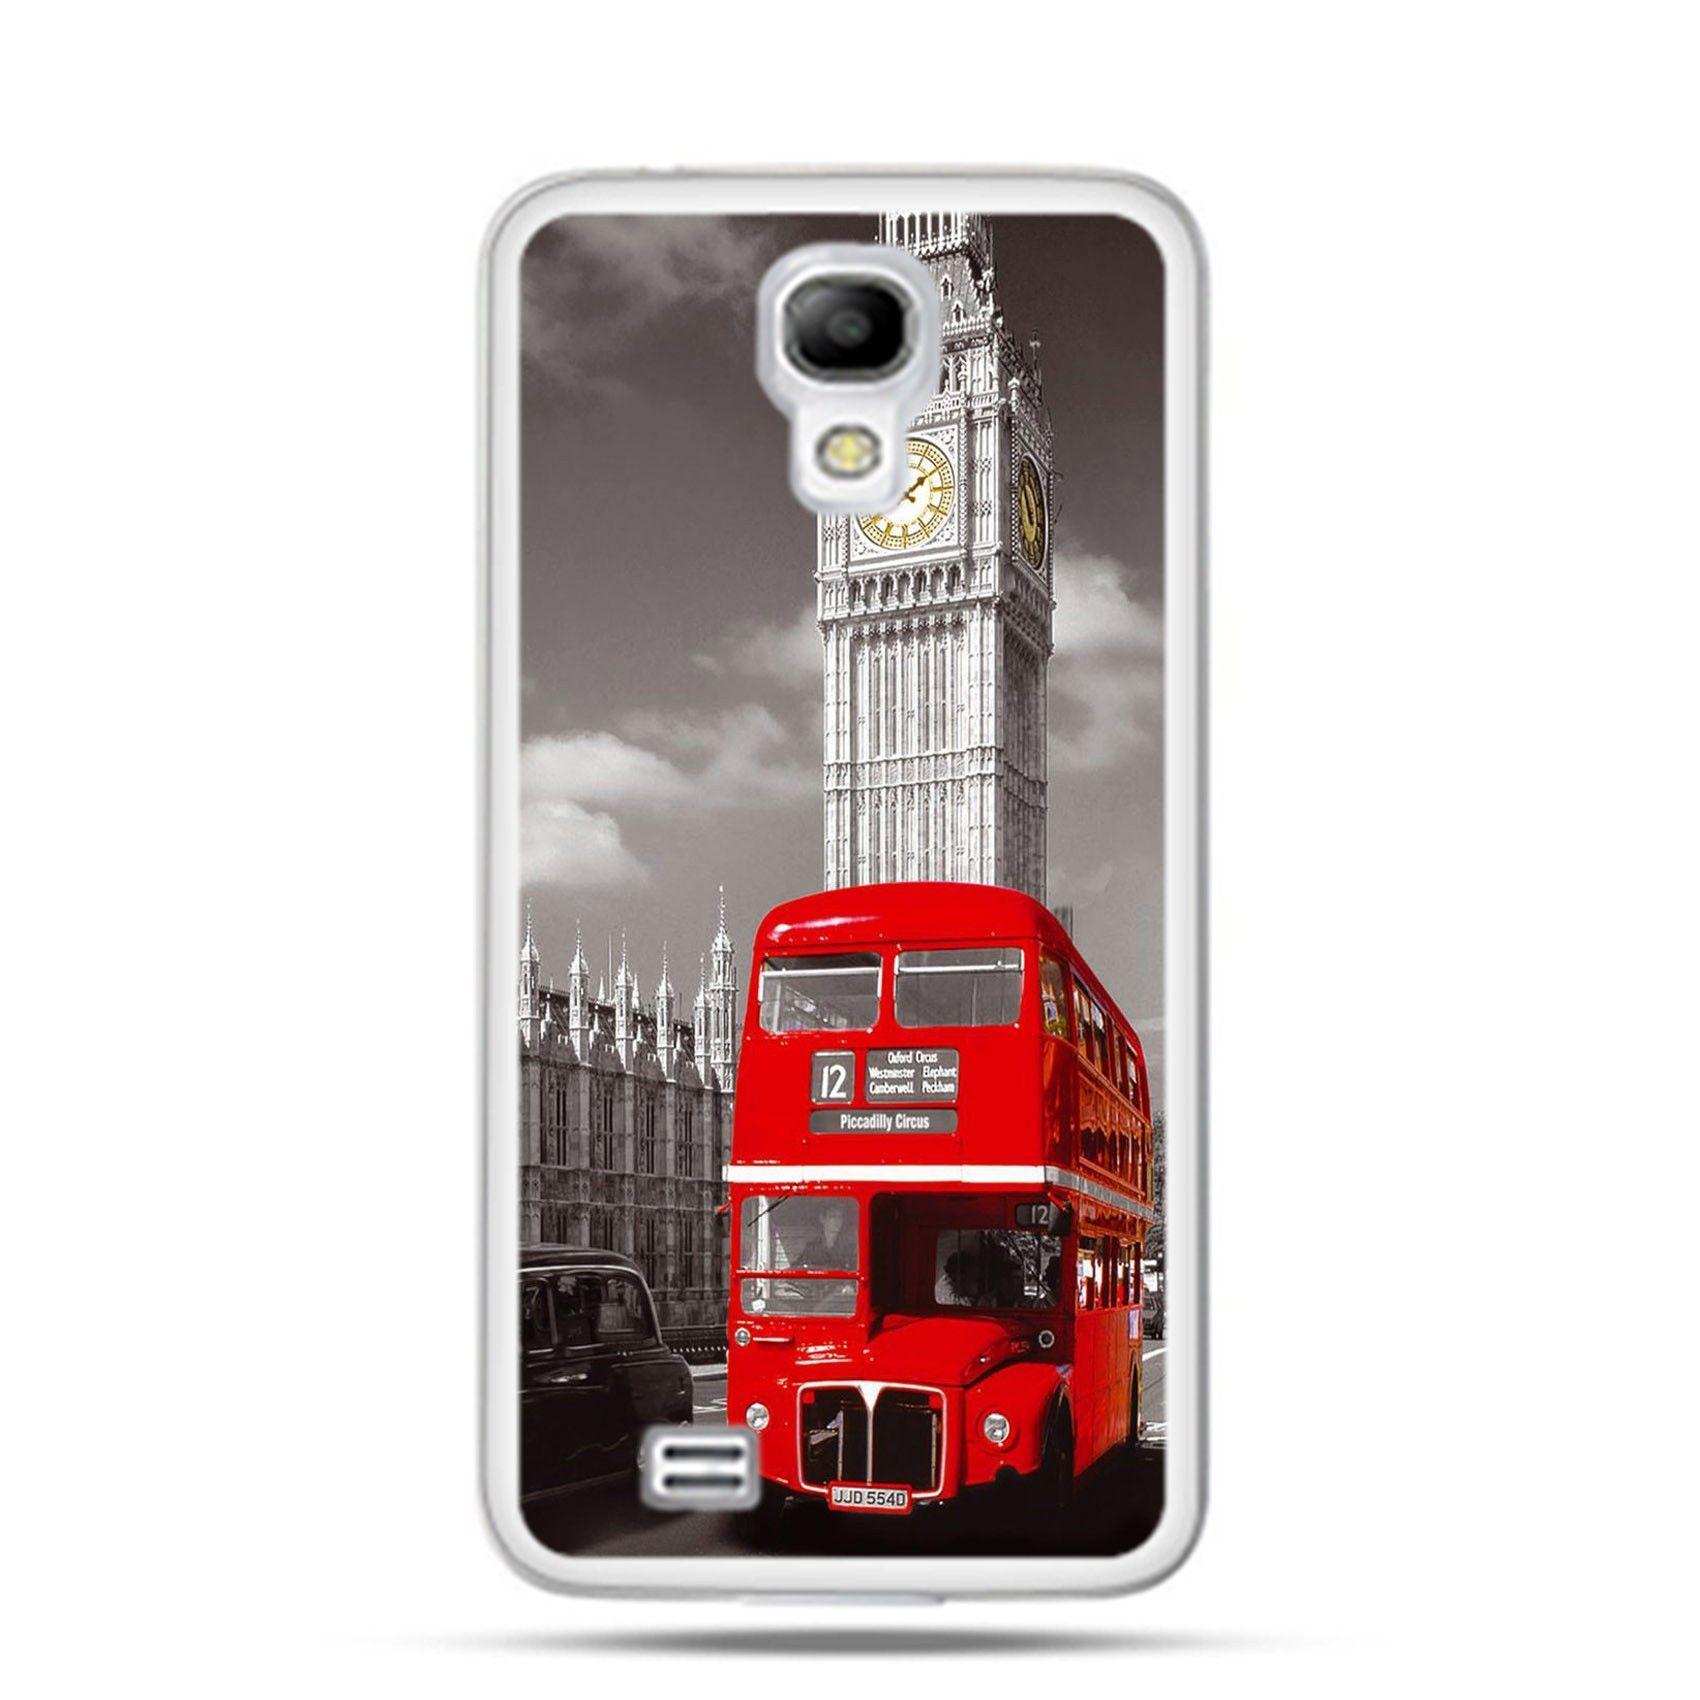 Etui londyński autobus Samsung S4 mini